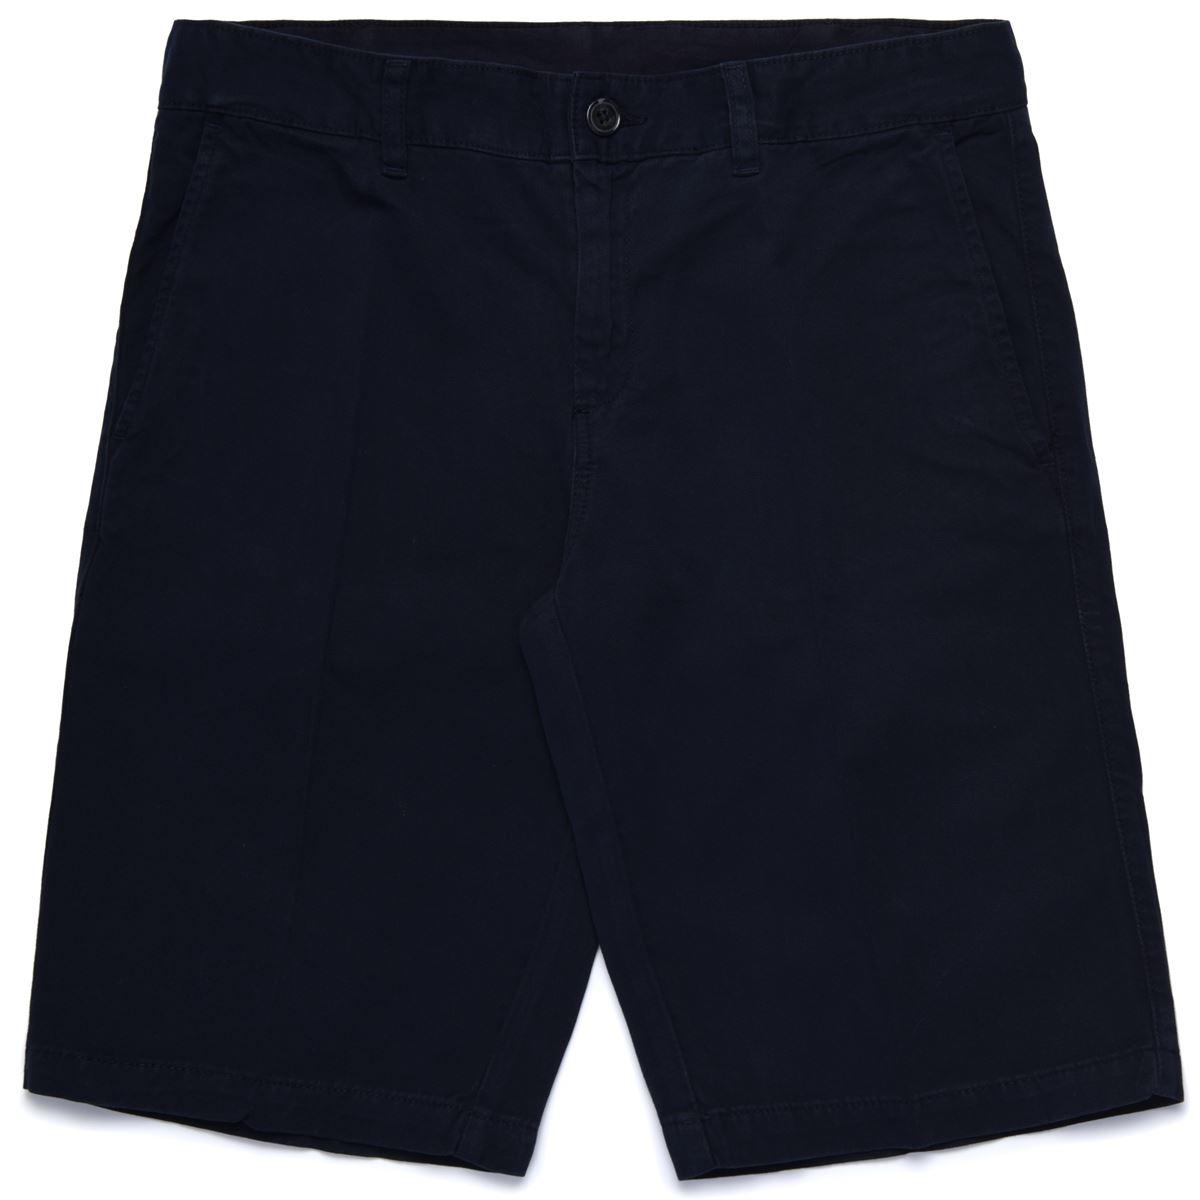 Robe di Kappa Pantaloncini uomo-600BTI0